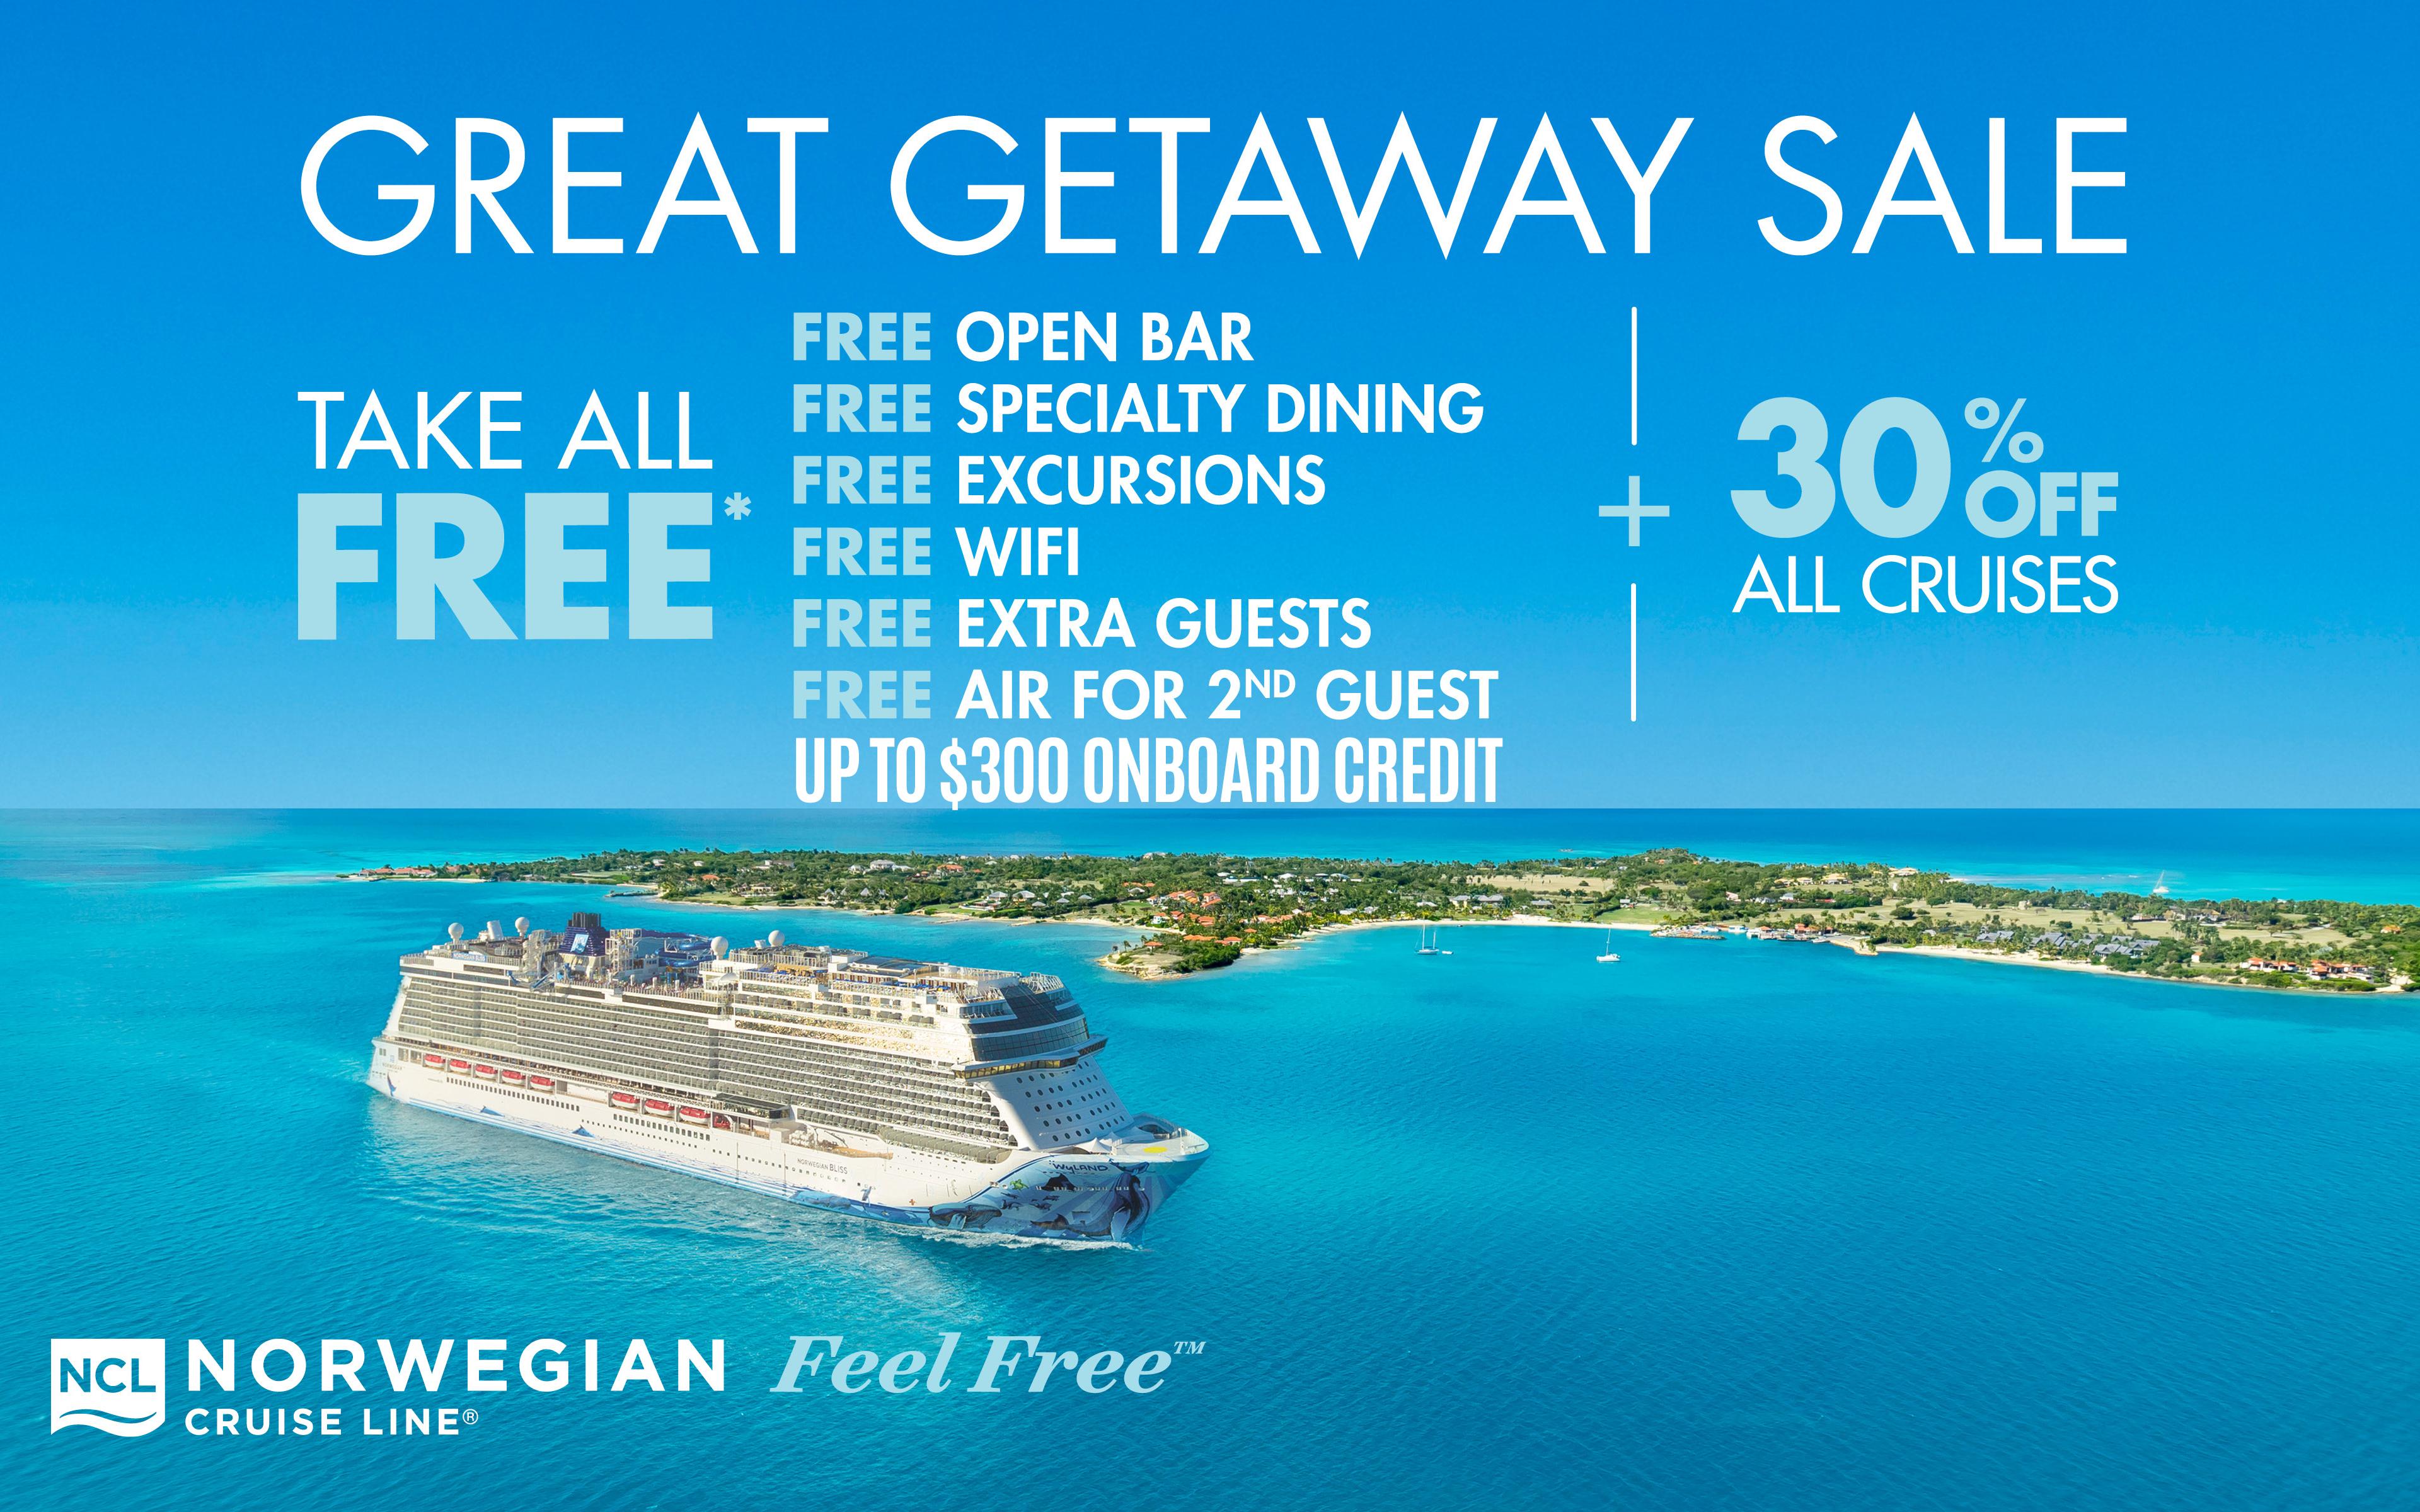 Take ALL FREE + 30% Off All Cruise Fare